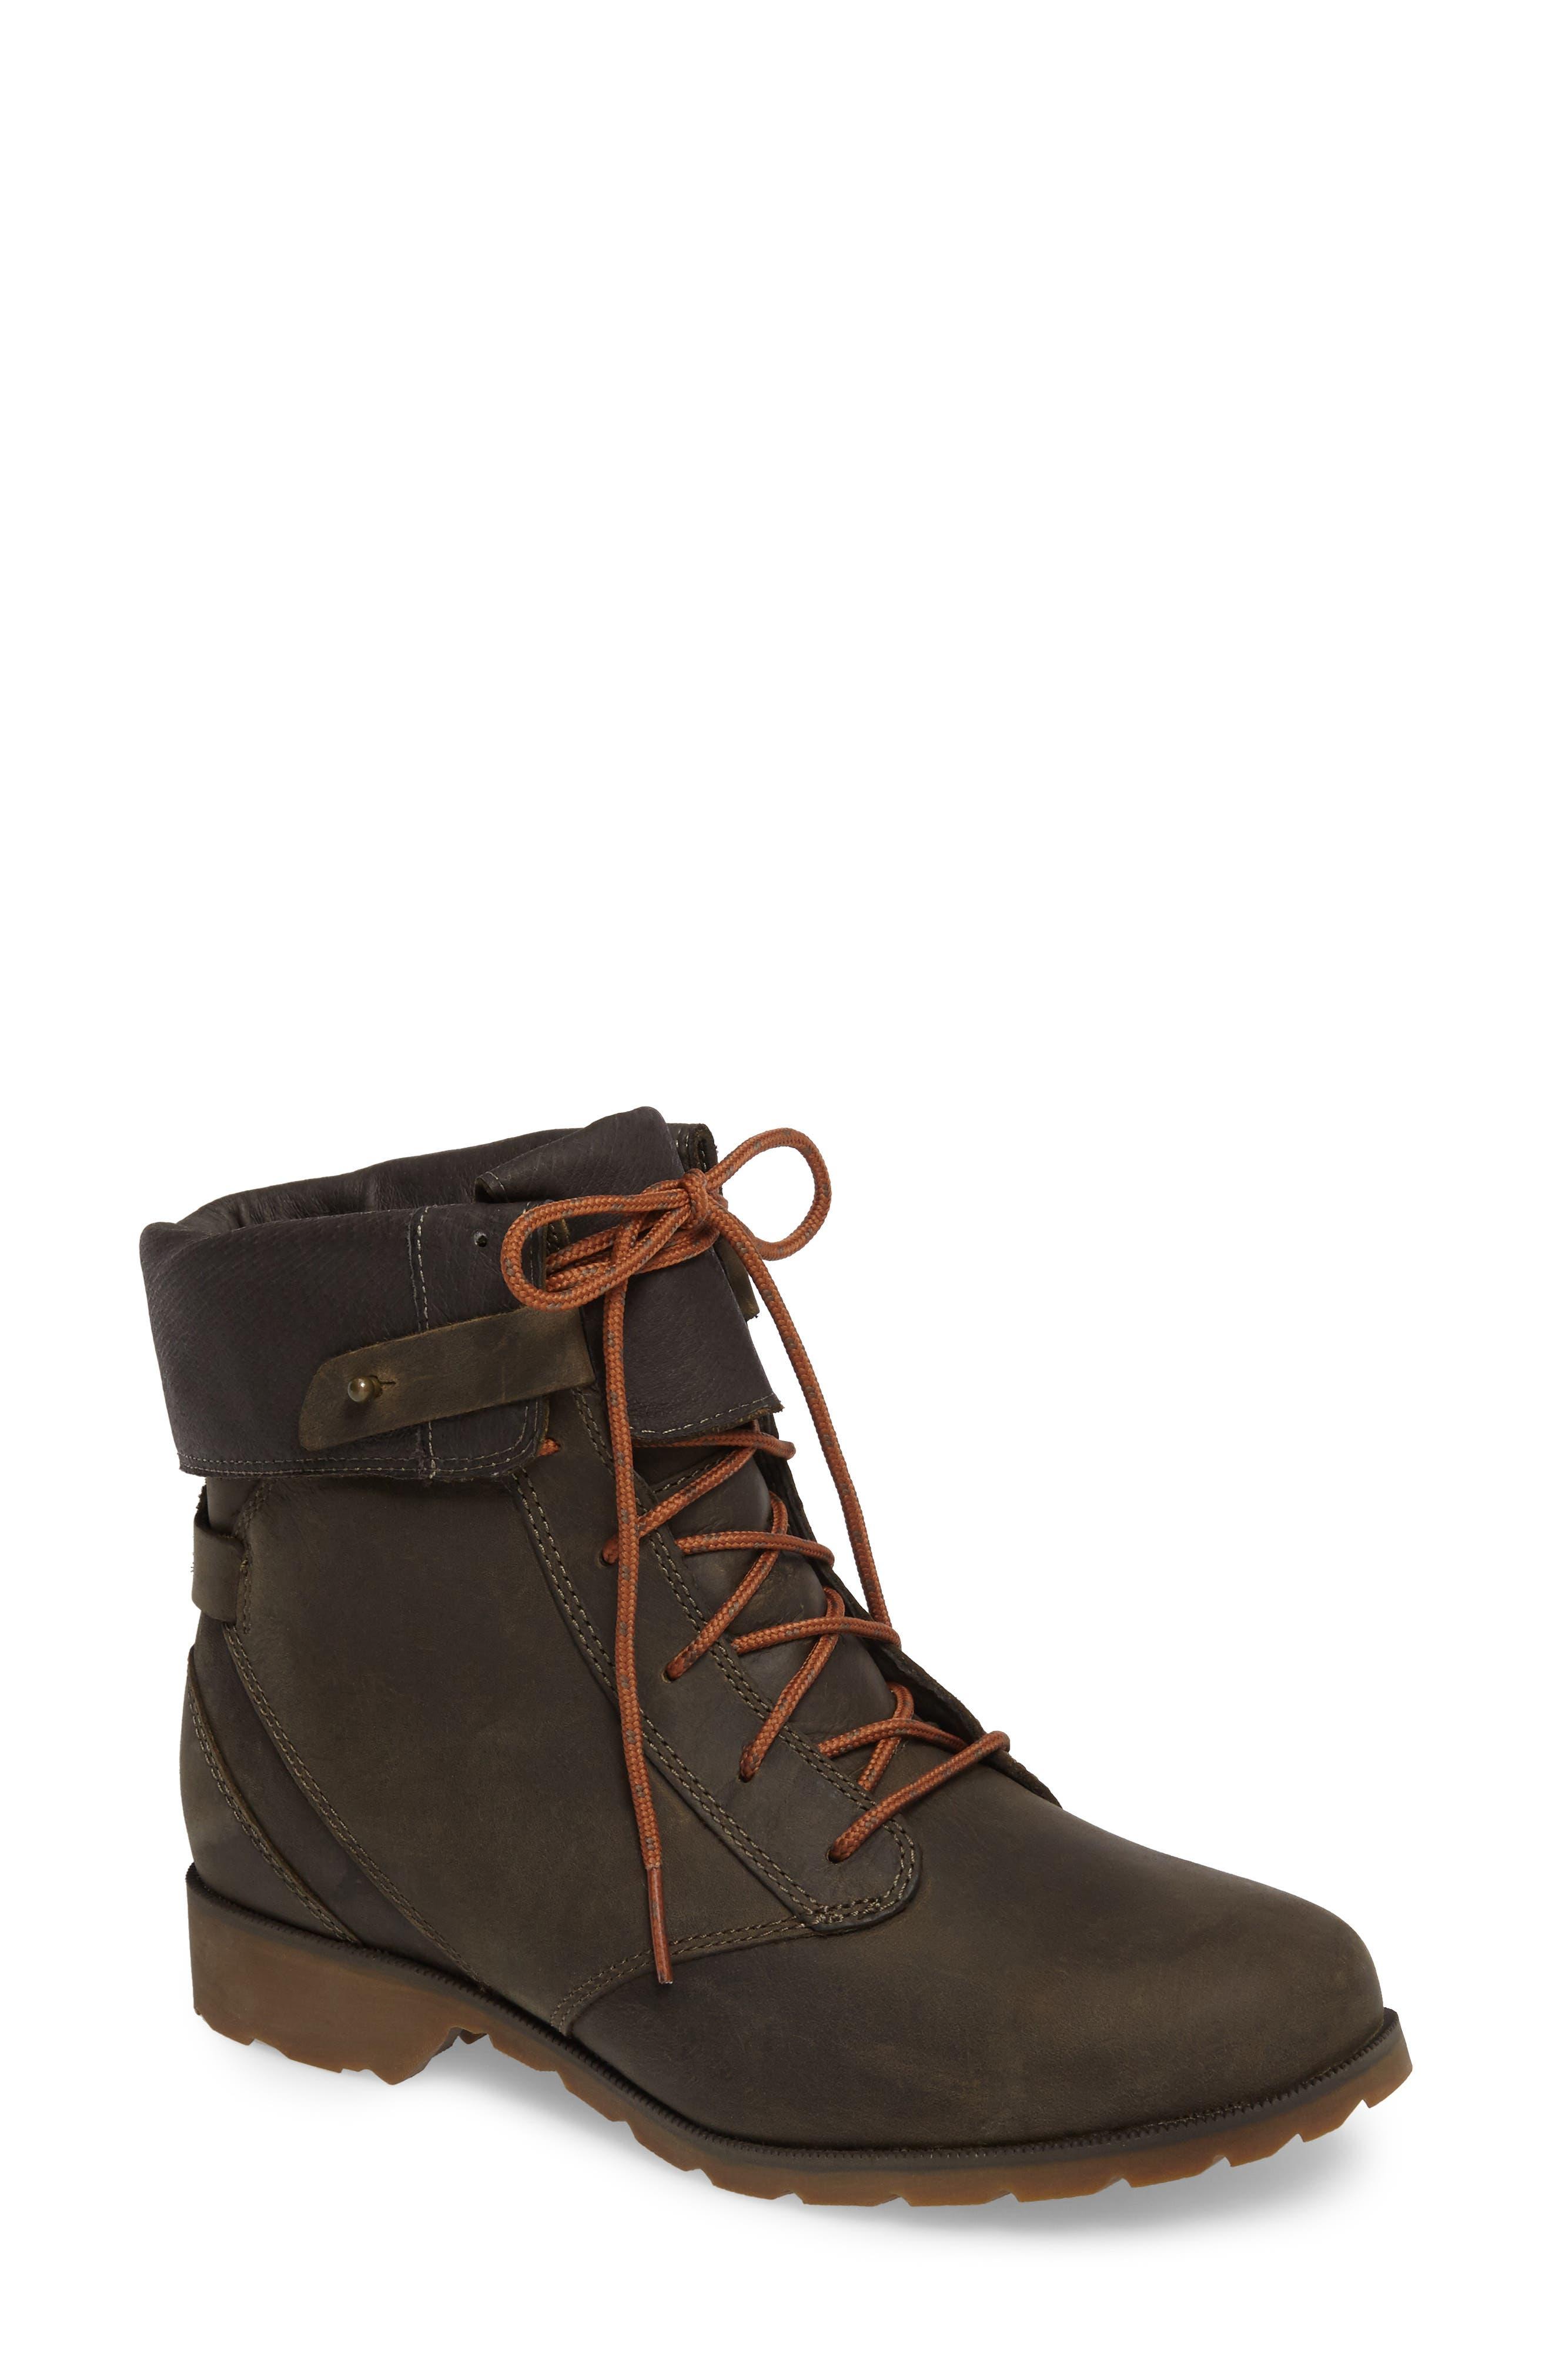 'De La Vina' Waterproof Lace-Up Boot,                             Main thumbnail 1, color,                             Dark Olive Leather